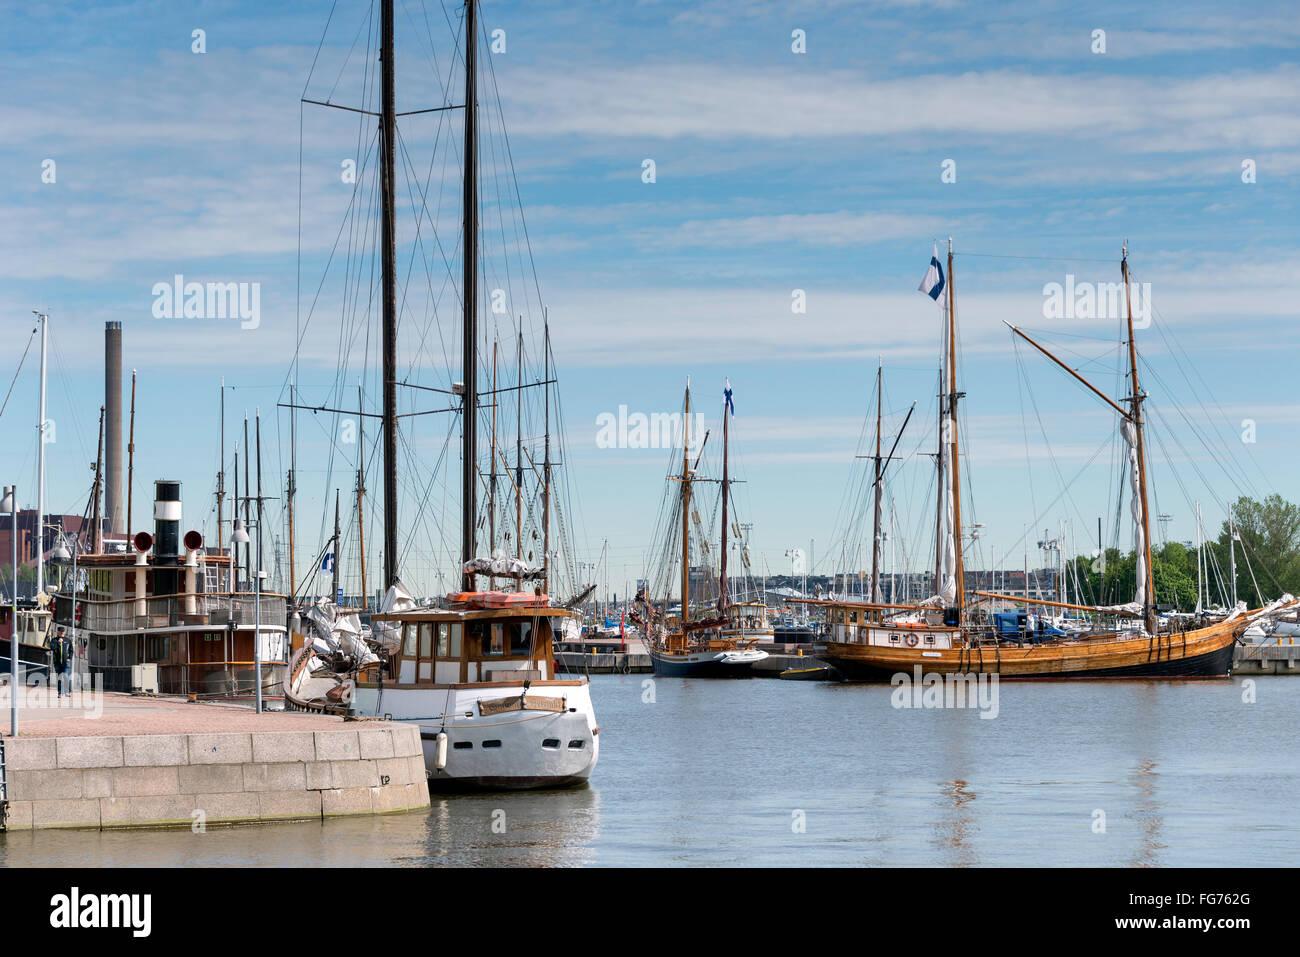 Boats moored on Pohjoisranta (E75), North Harbour (Pohjoissatama), Helsinki, Uusimaa Region, Republic of Finland - Stock Image